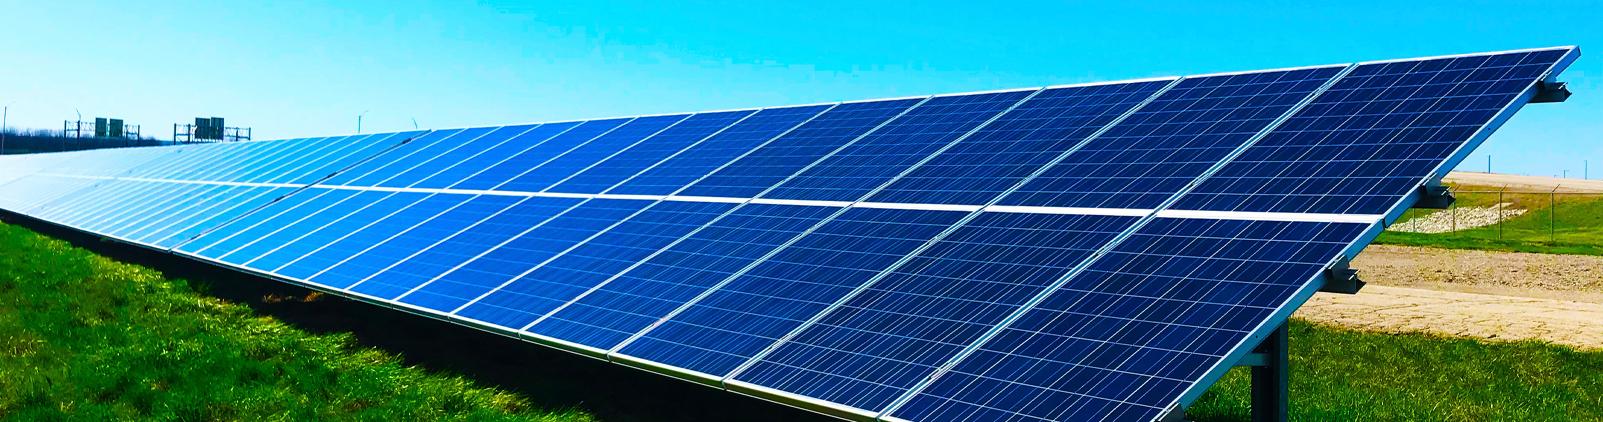 Image of solar panels - banner image